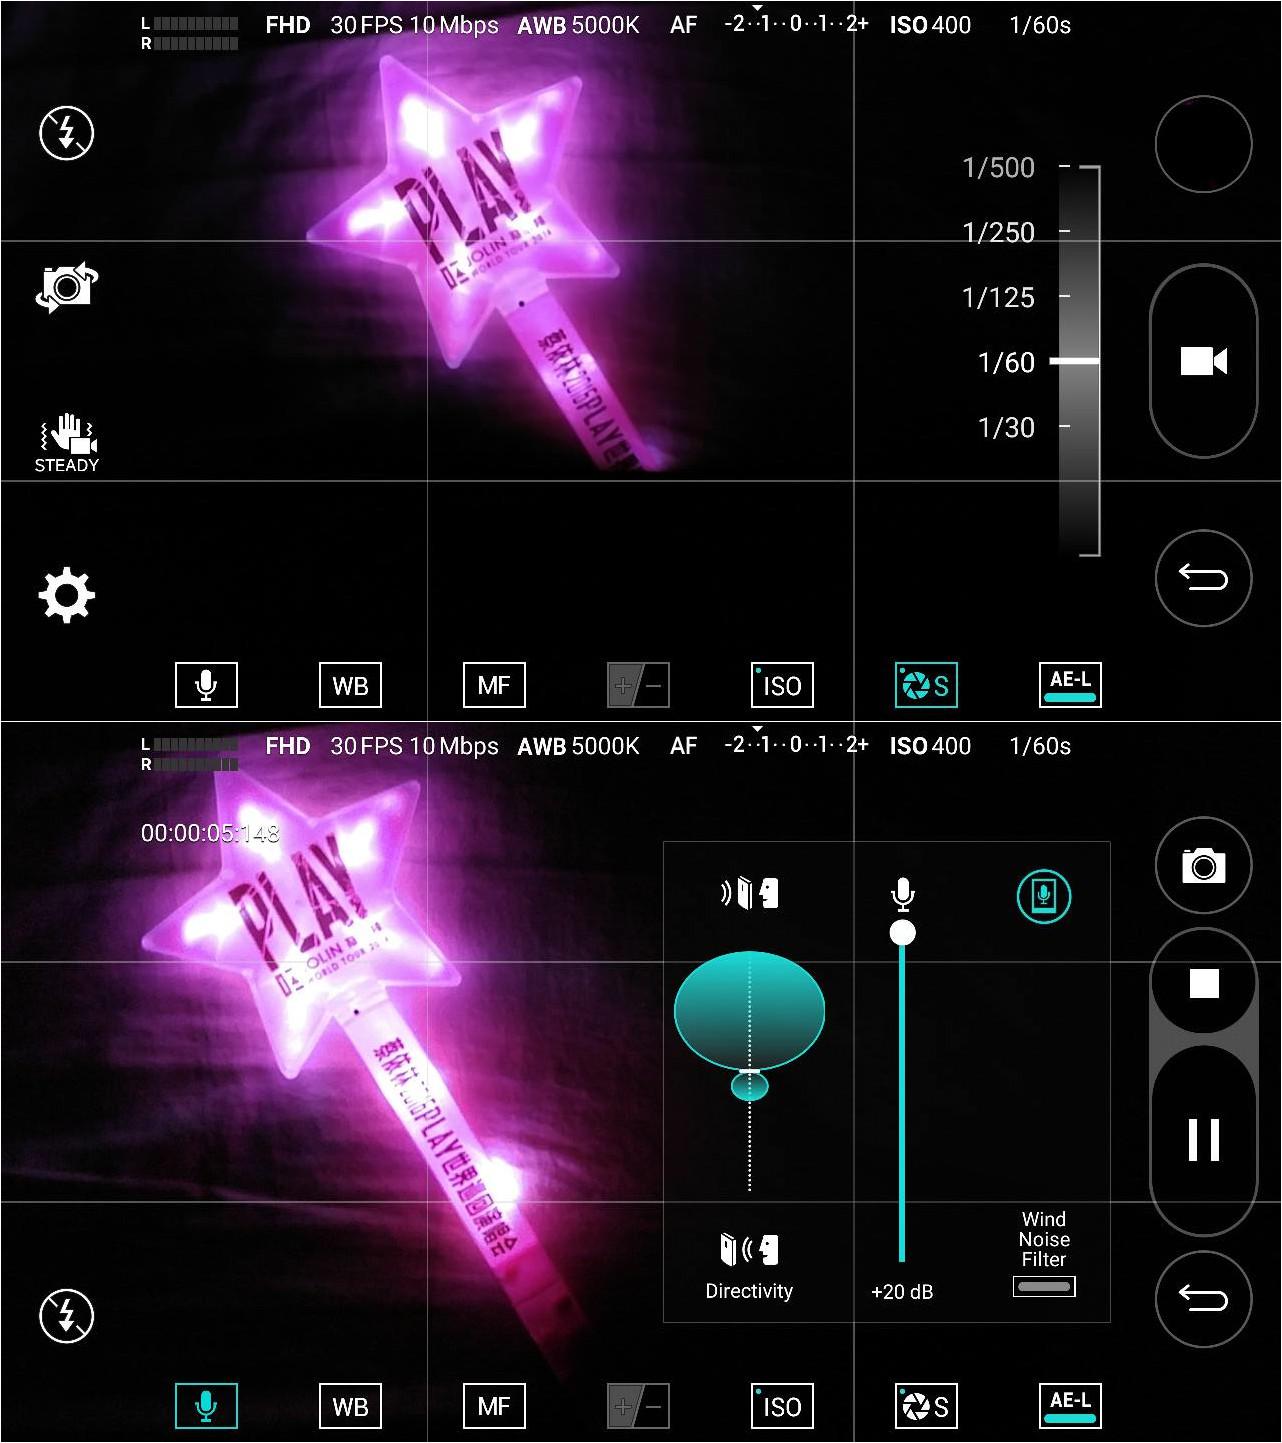 LG V10 Video Manual Mode